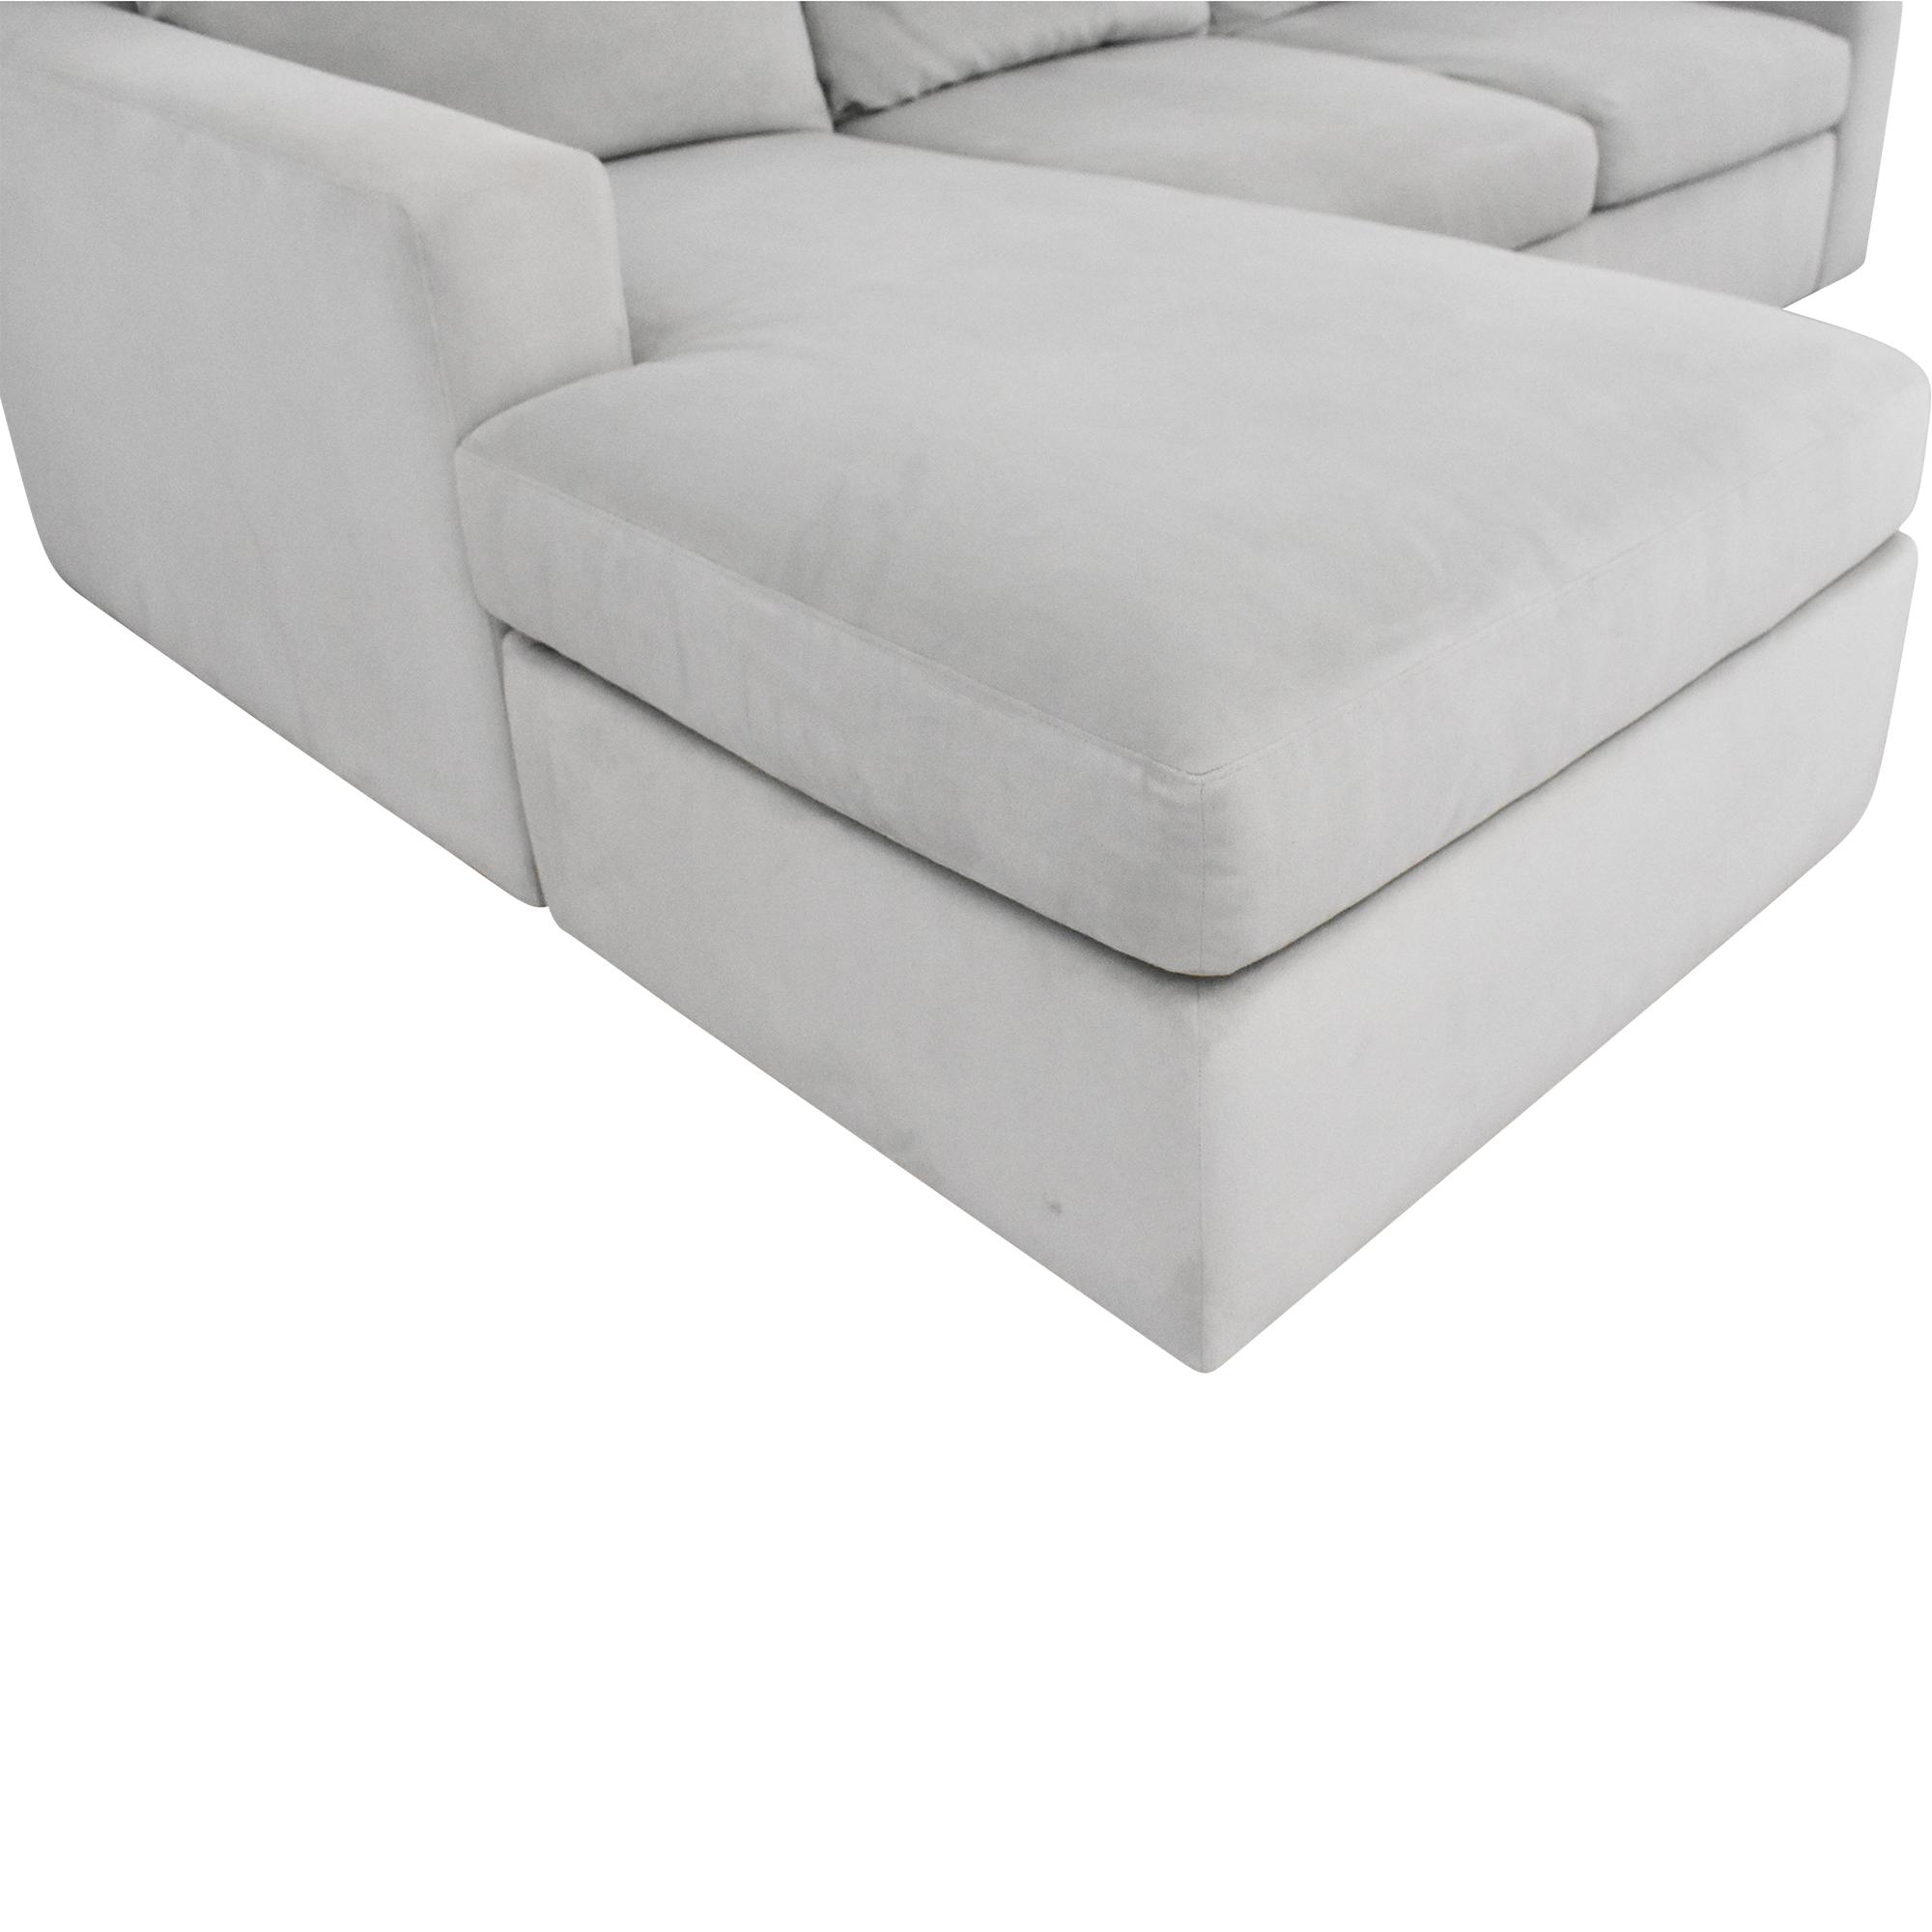 Room & Board Room & Board Taft Sofa with Chaise price